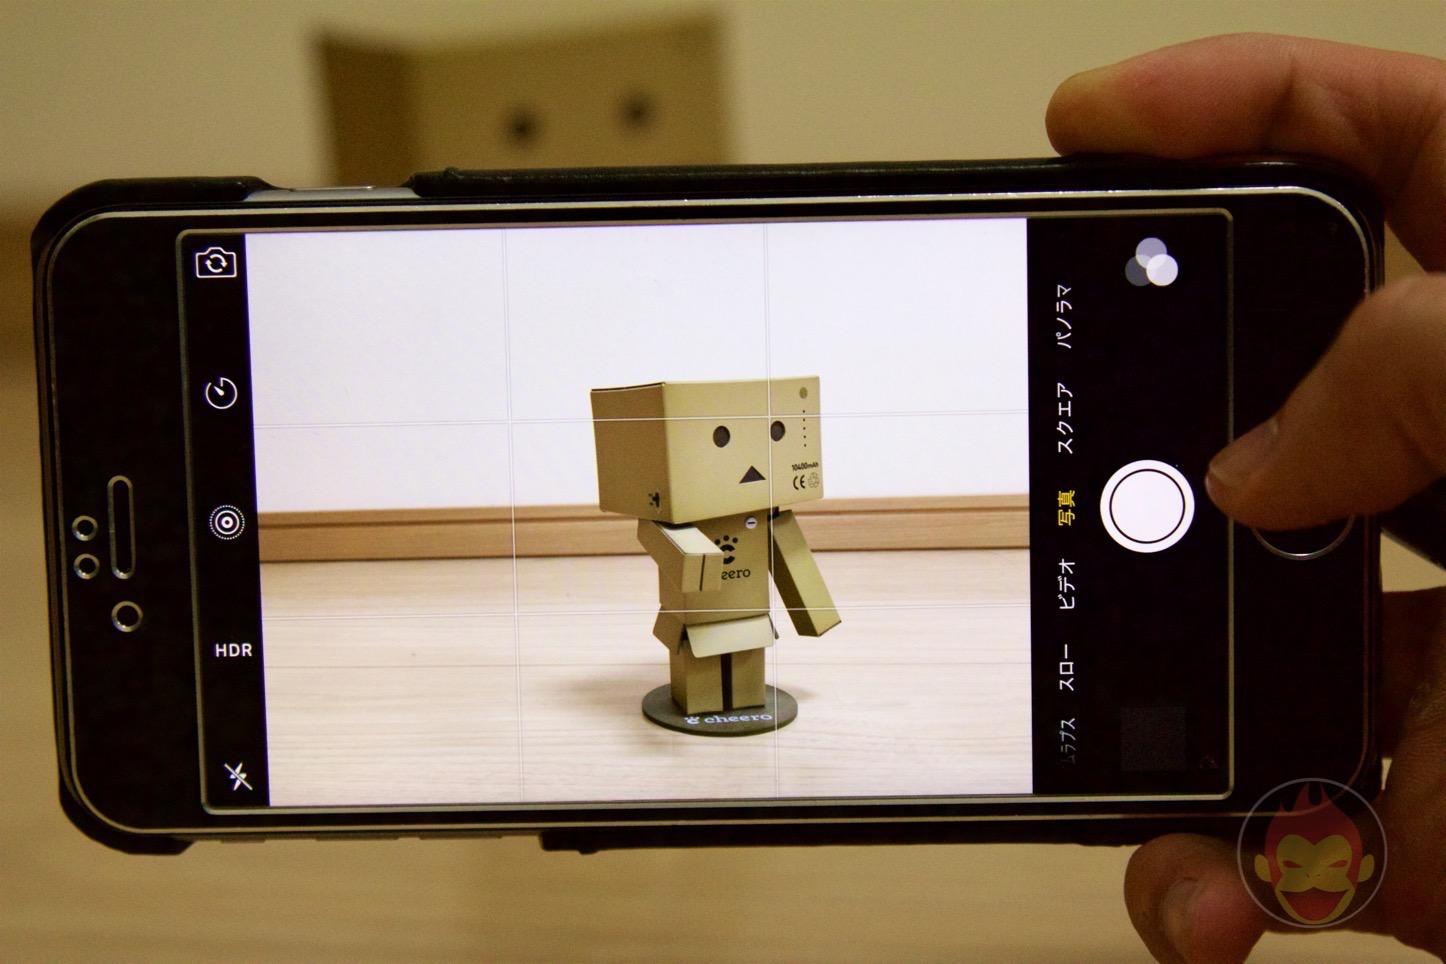 「iPhone SE」ってどう?「iPhone 6s/6s Plus」と徹底比較